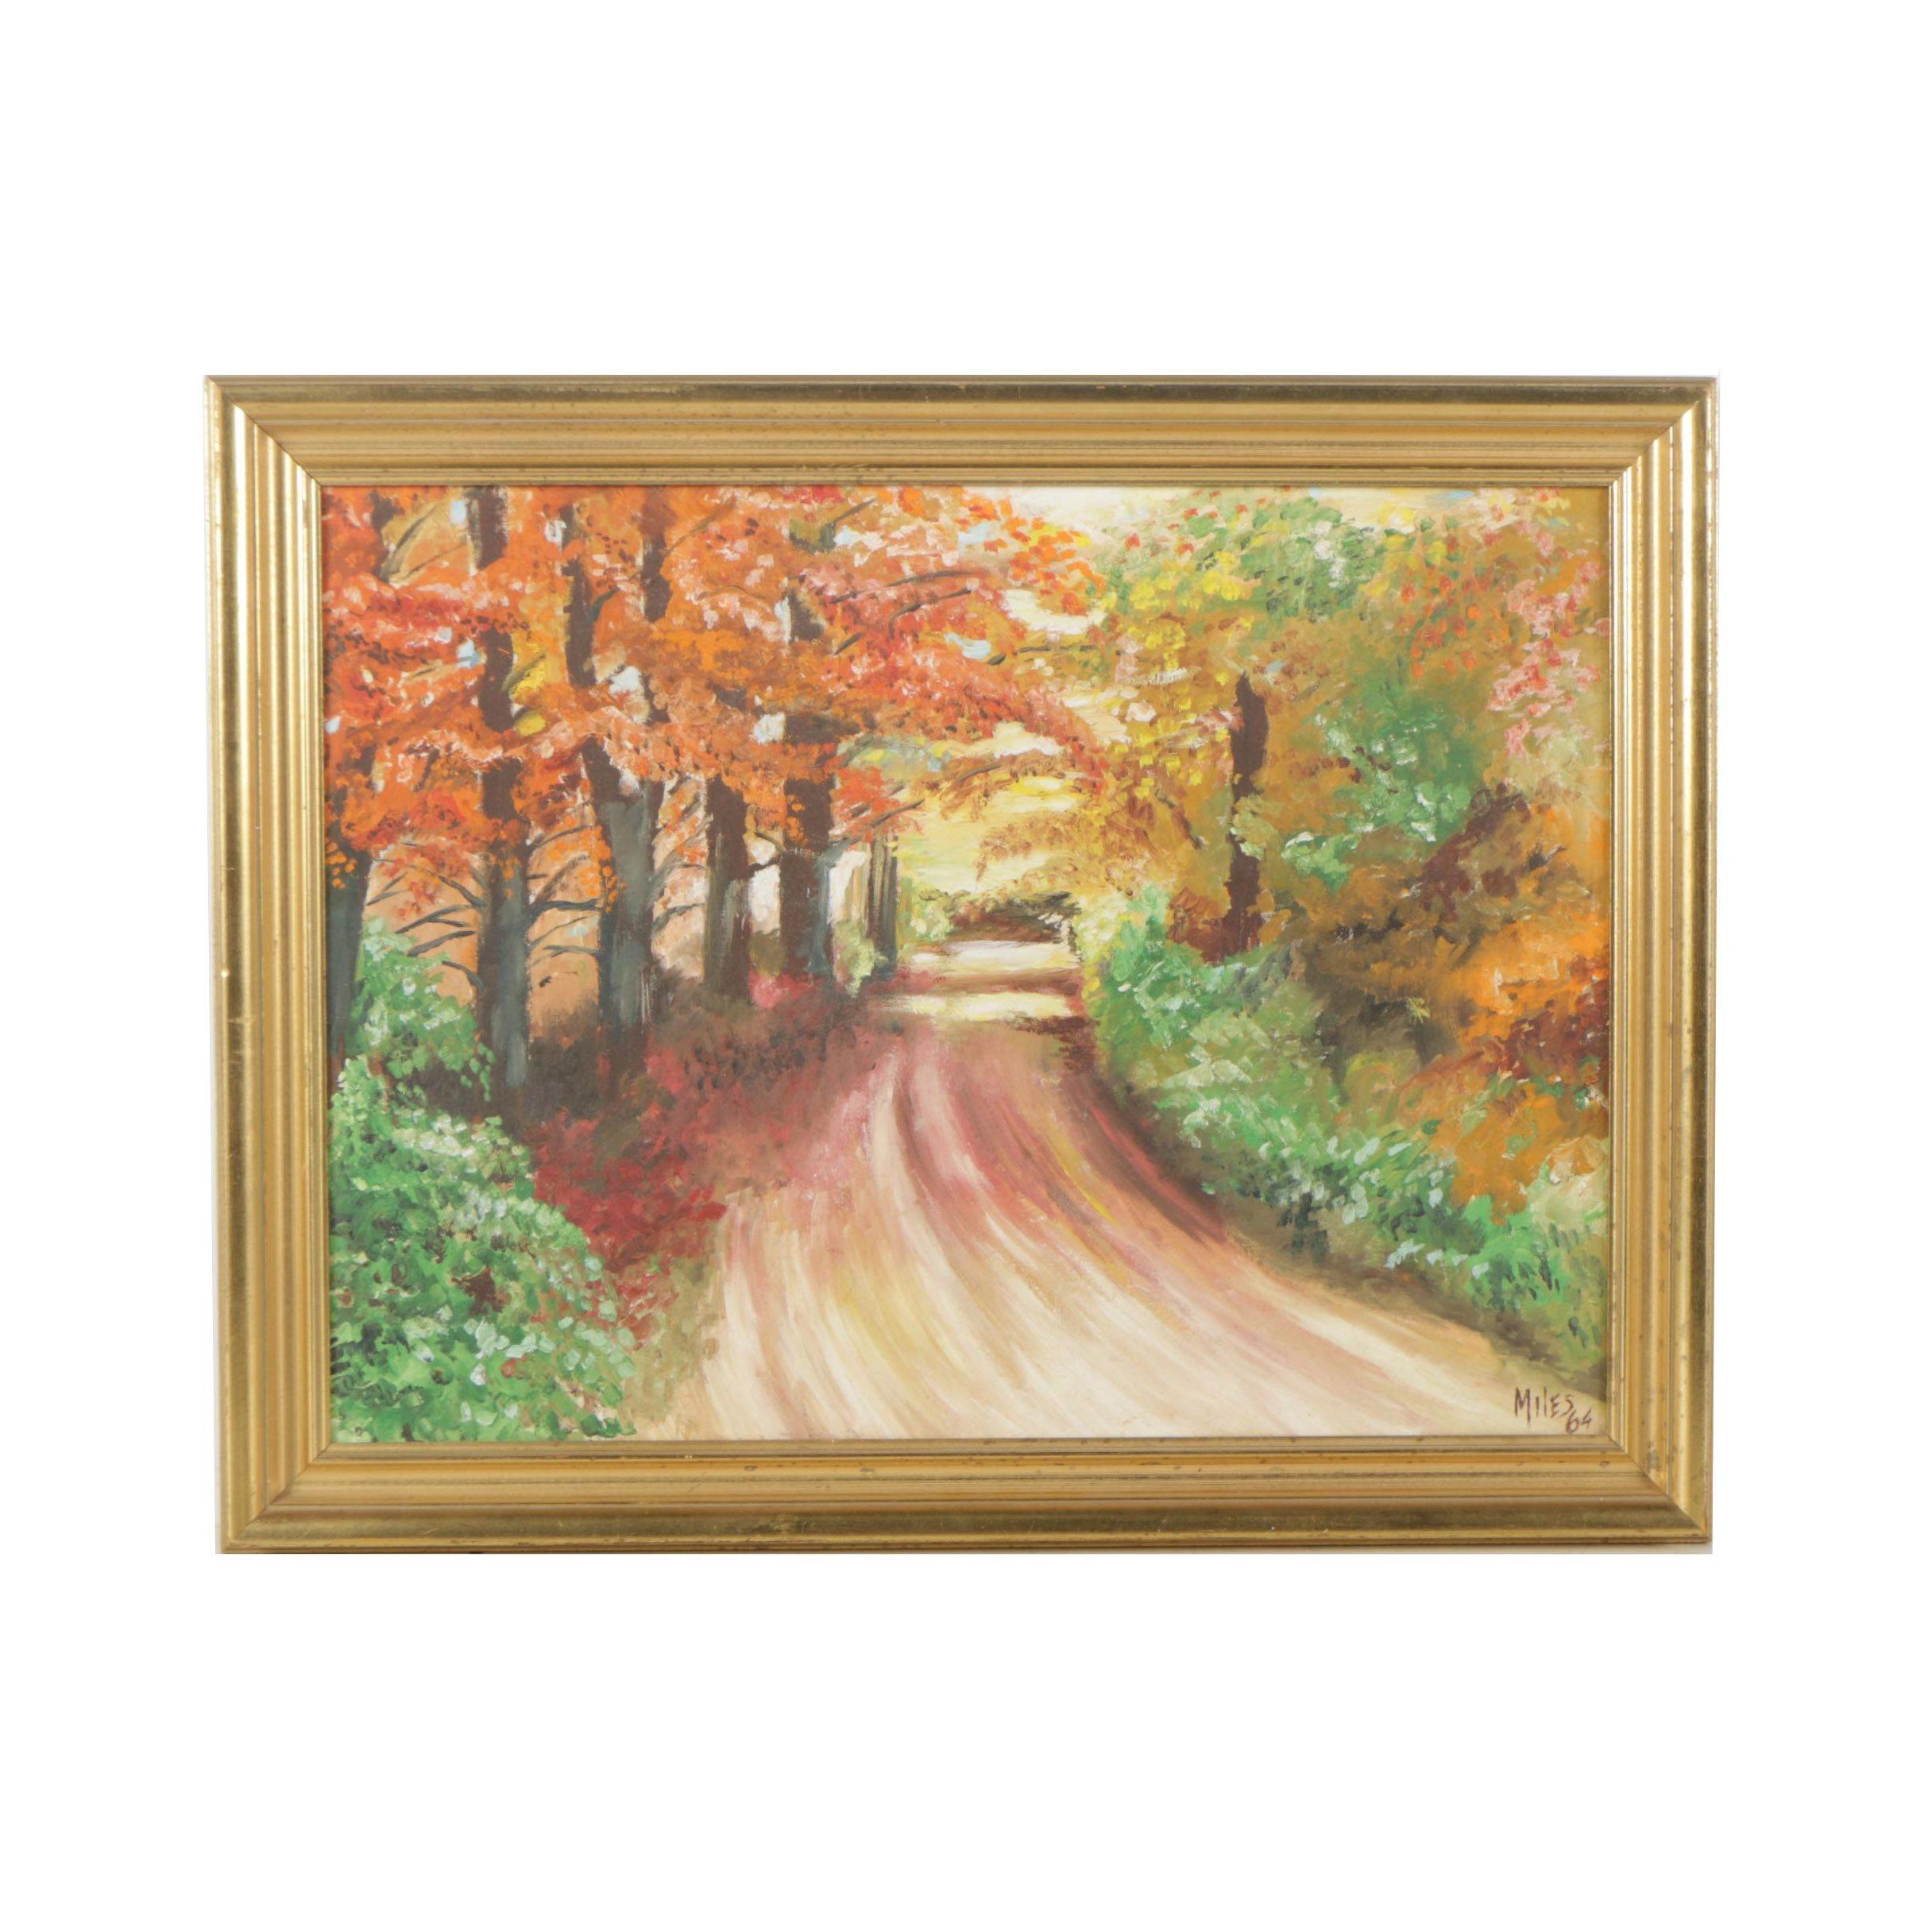 Original Oil Painting Signed Miles 1964